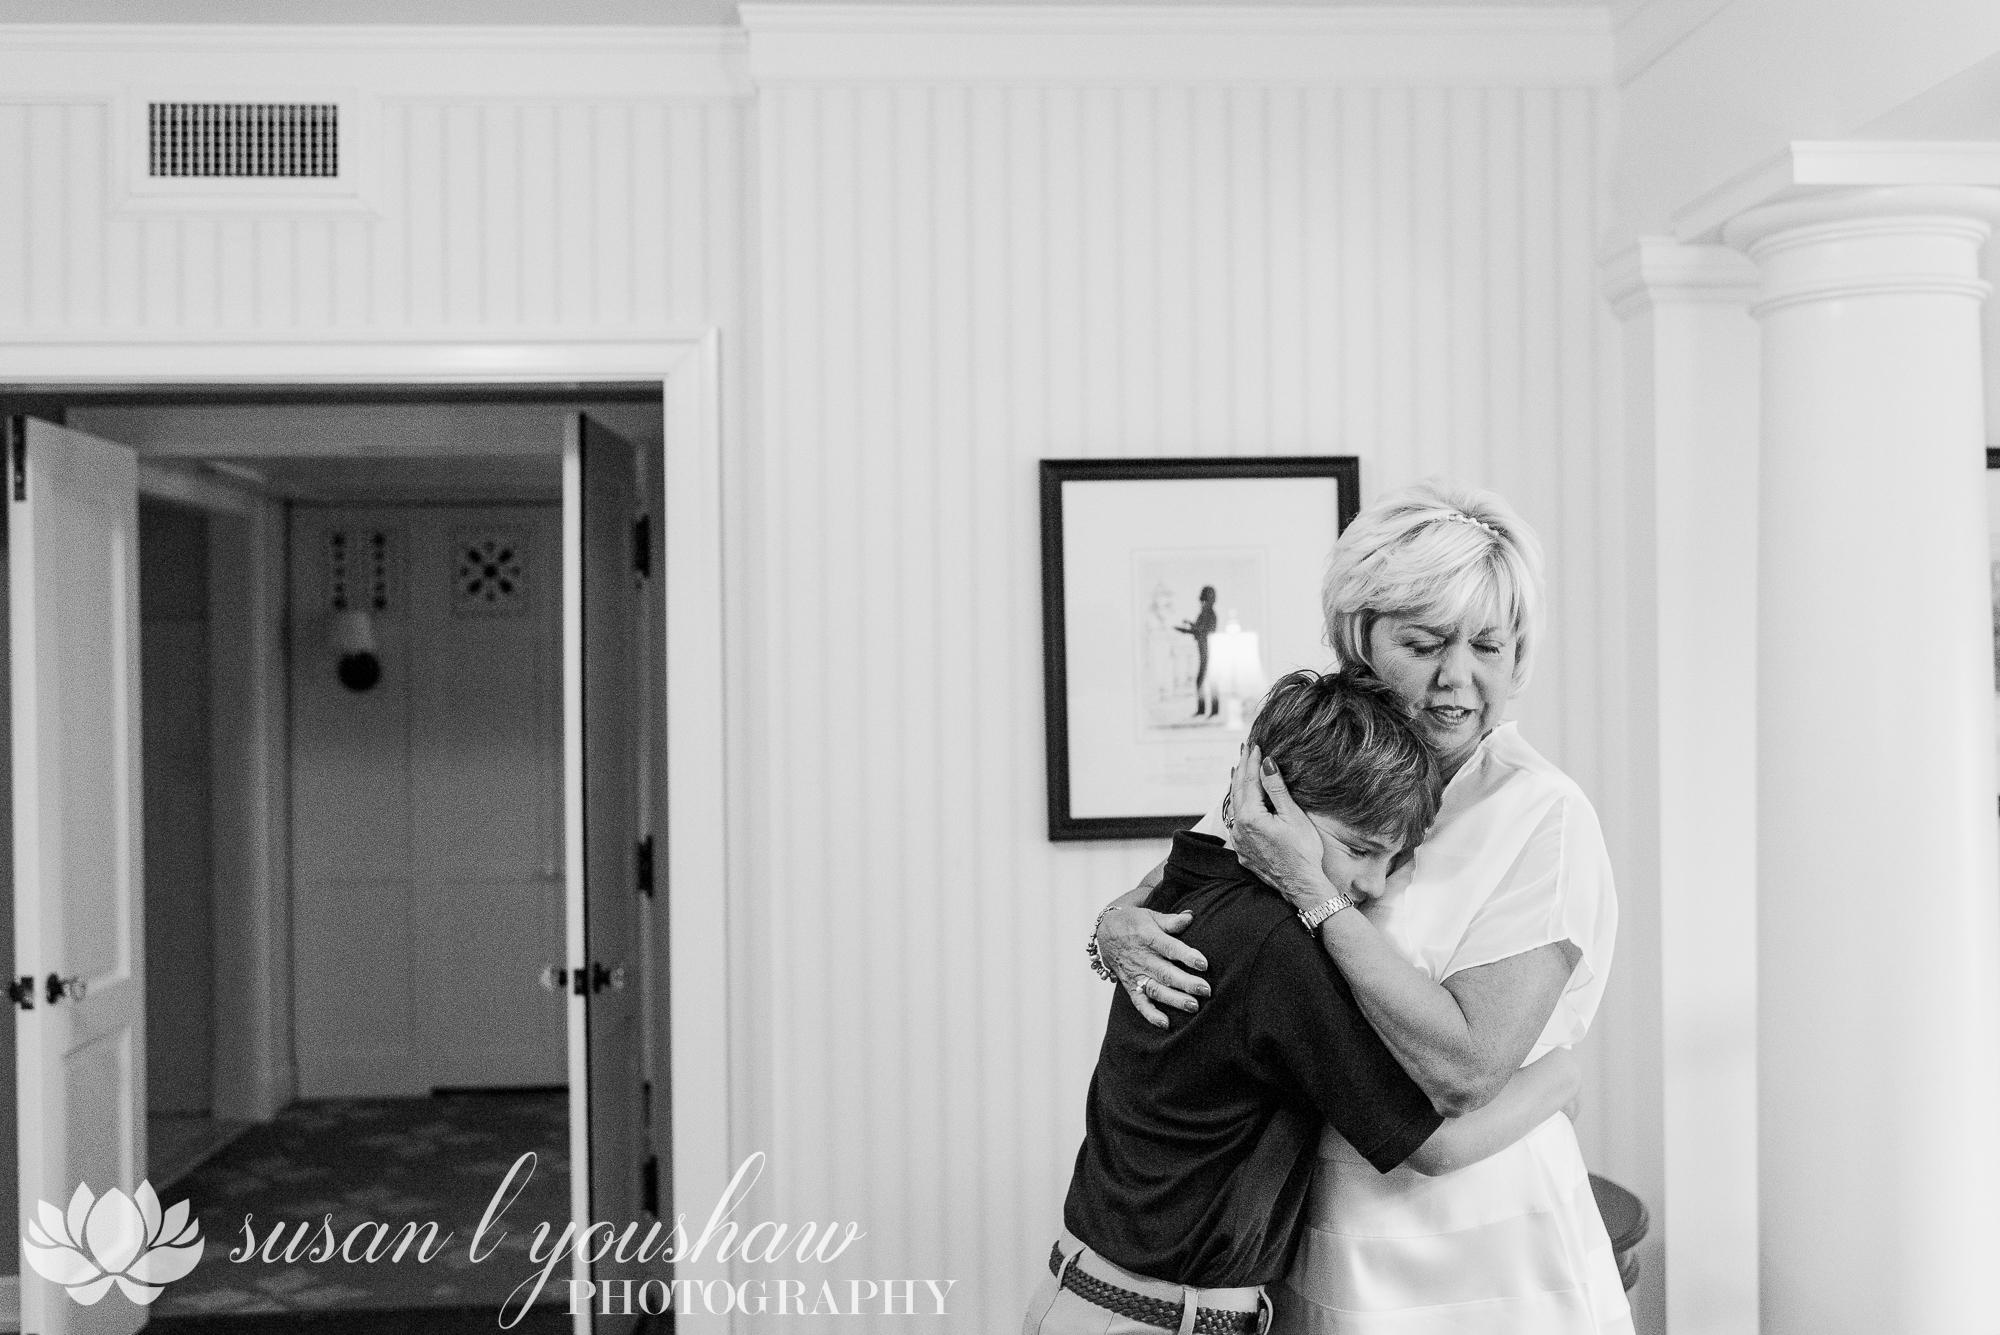 BLOG Carolyn Adams and Jim McCune 07-04-2018 SLY Photography-23.jpg